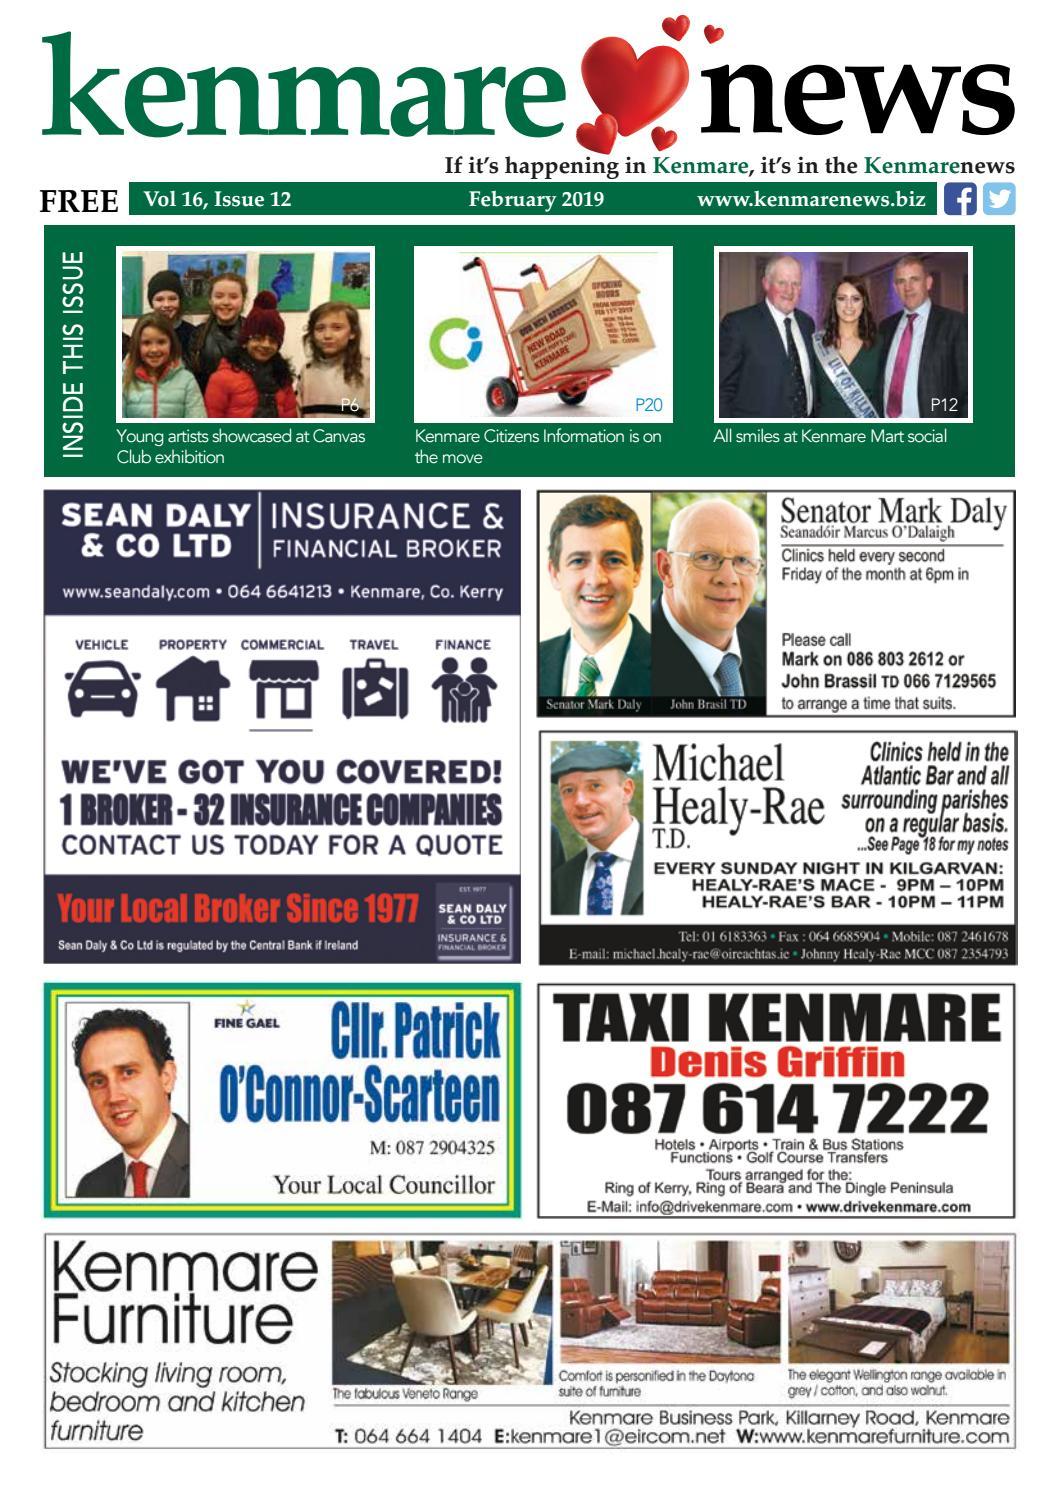 Kenmare singles - Meet Kenmare lonely people in Ireland